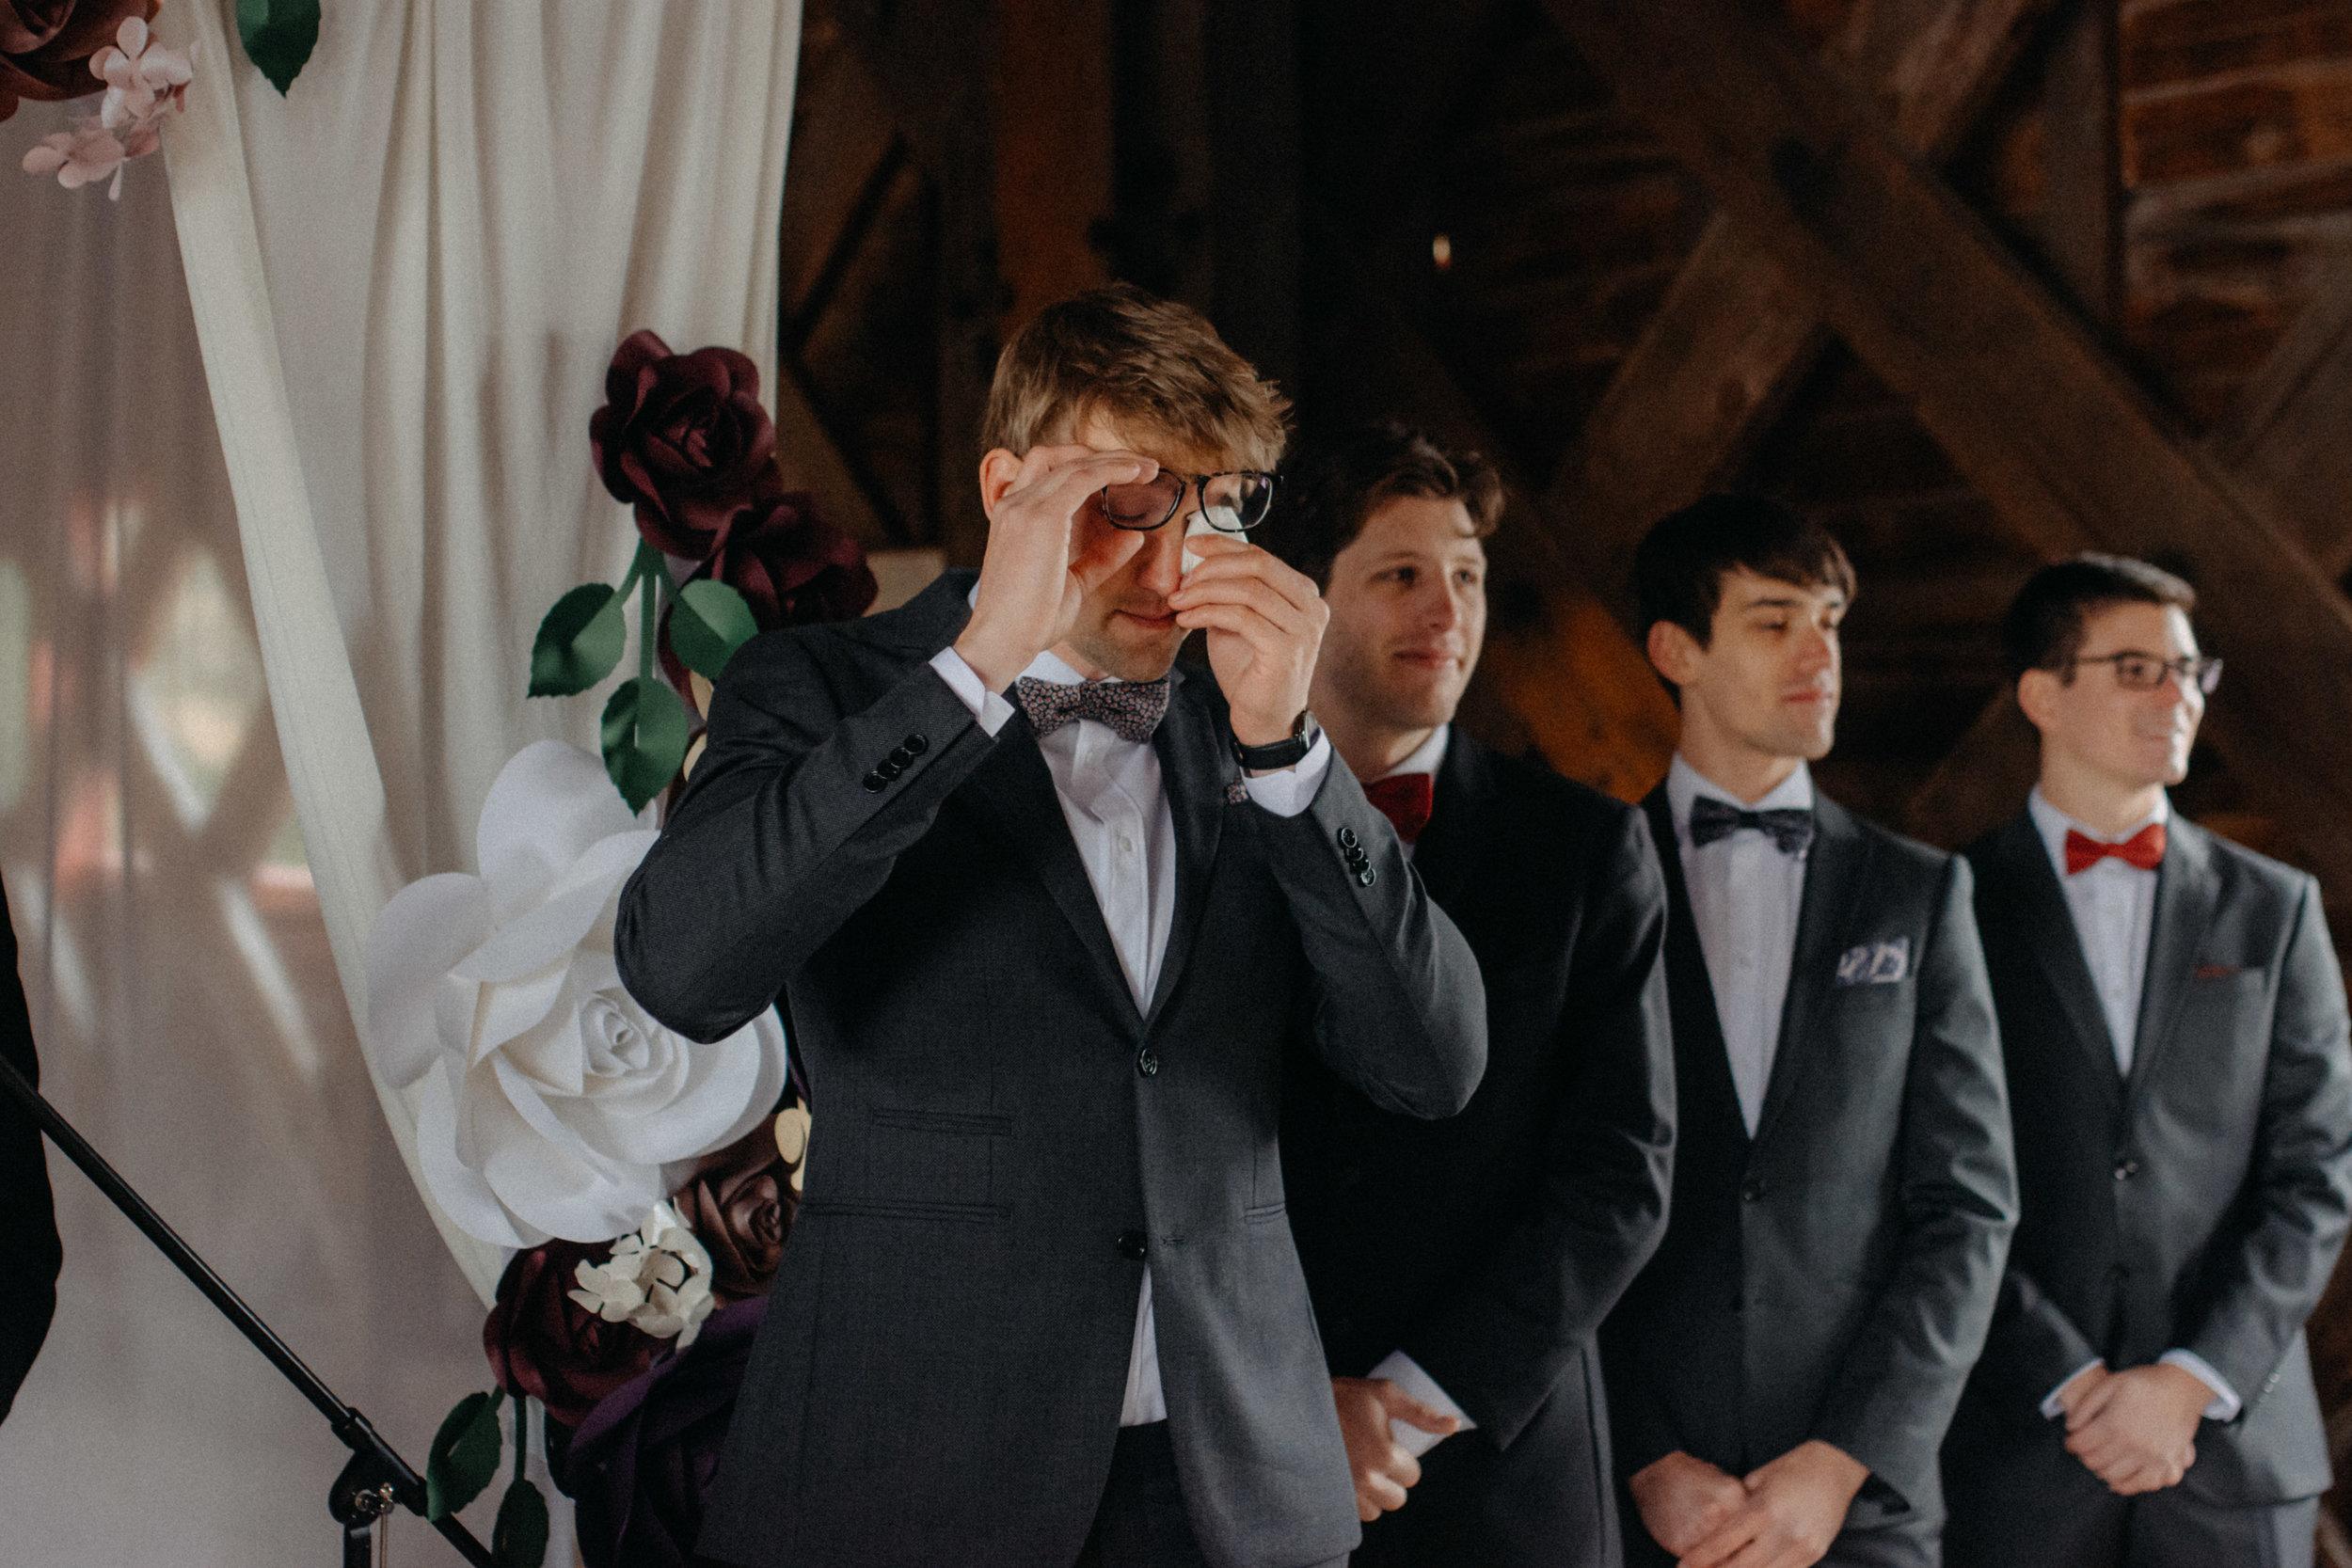 photographe_gatineau_mariage_ottawa_photographer_wedding_natasha_liard_photo_documentary_candid_lifestyle_wakefield_mill_red_bridge (16).jpg